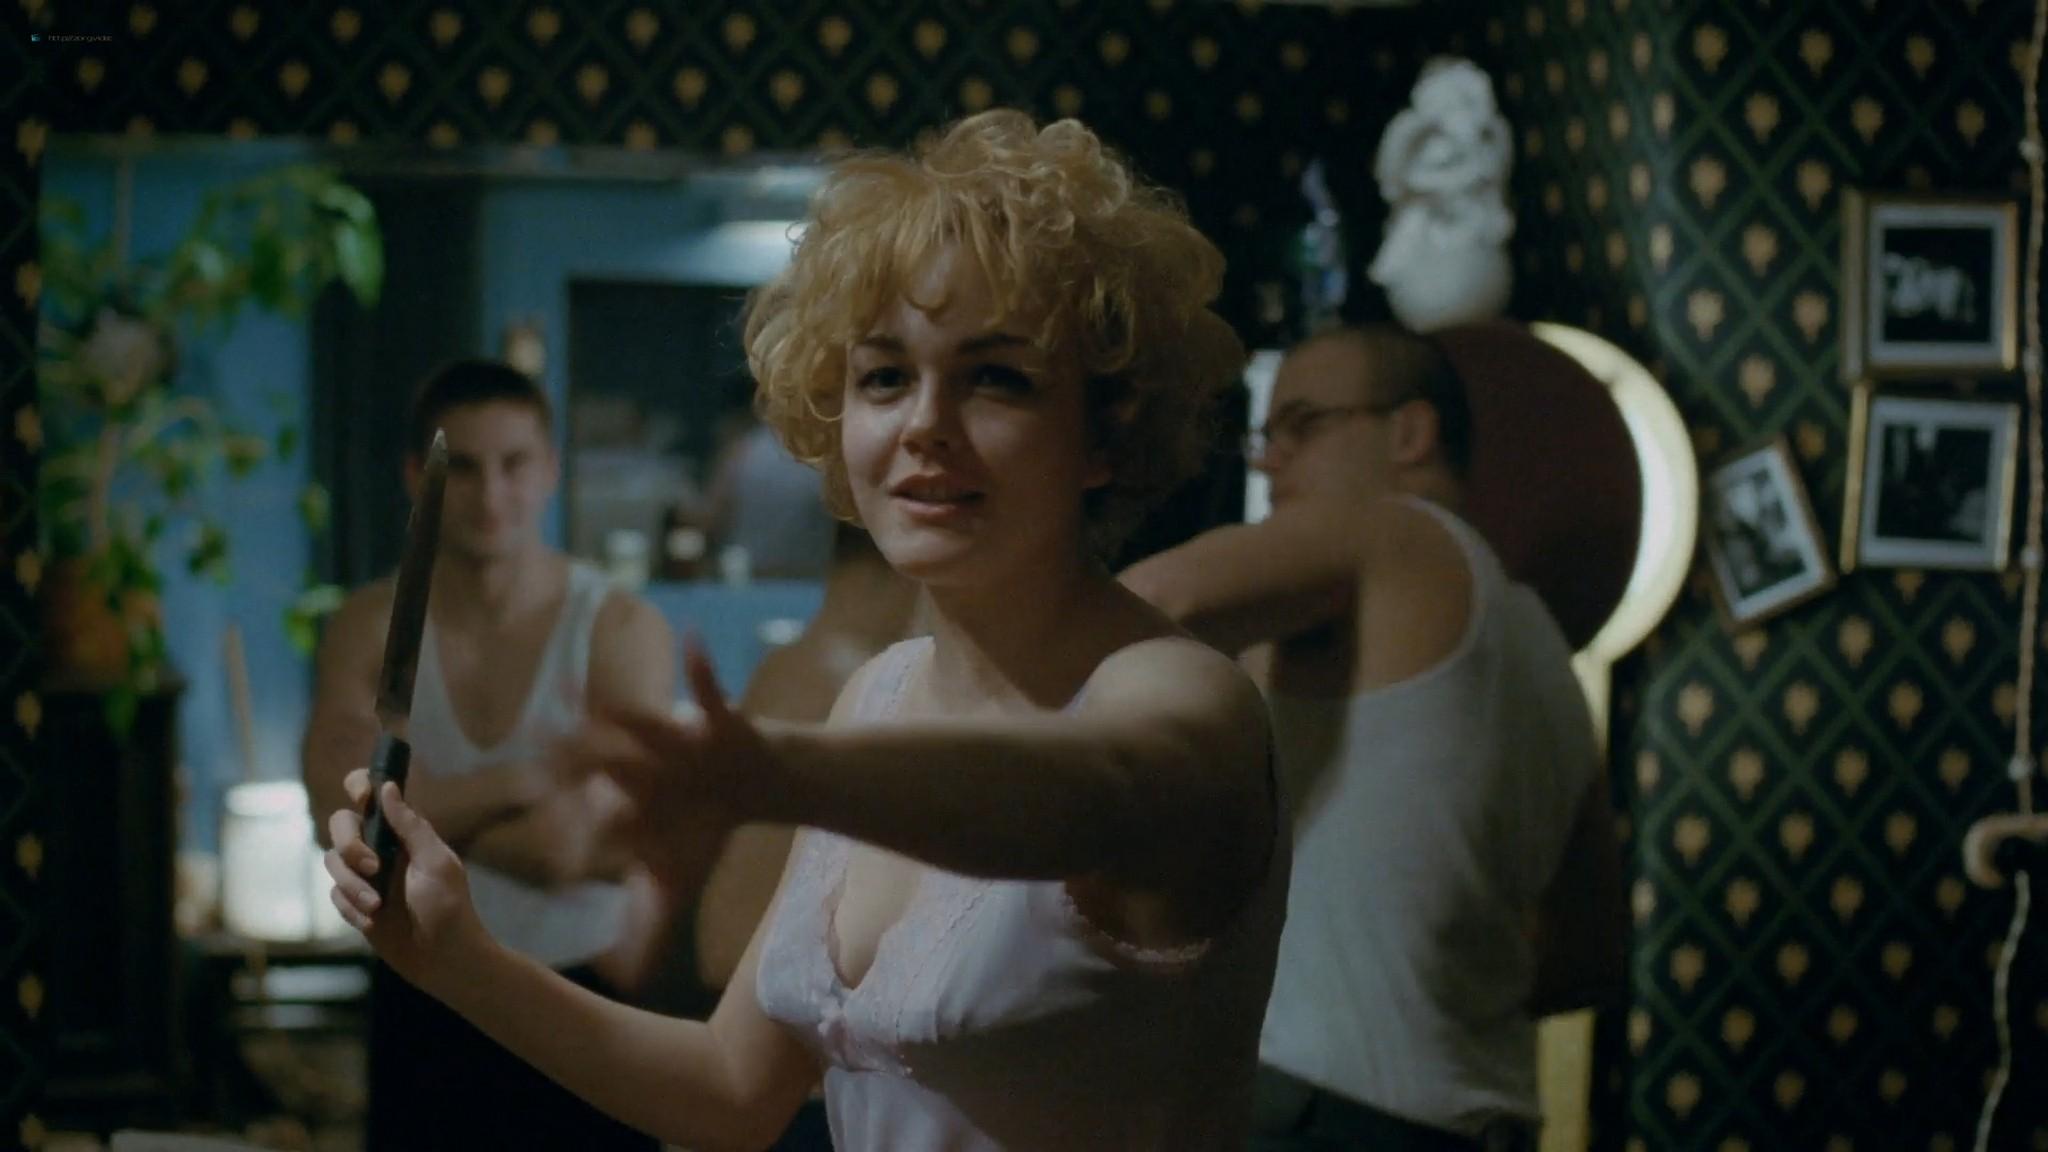 Kristina Babich nude sex Viktoria Skitskaya, Kristina Voloshina nude too- DAU Degeneratsiya (2020) HD 1080p (2)